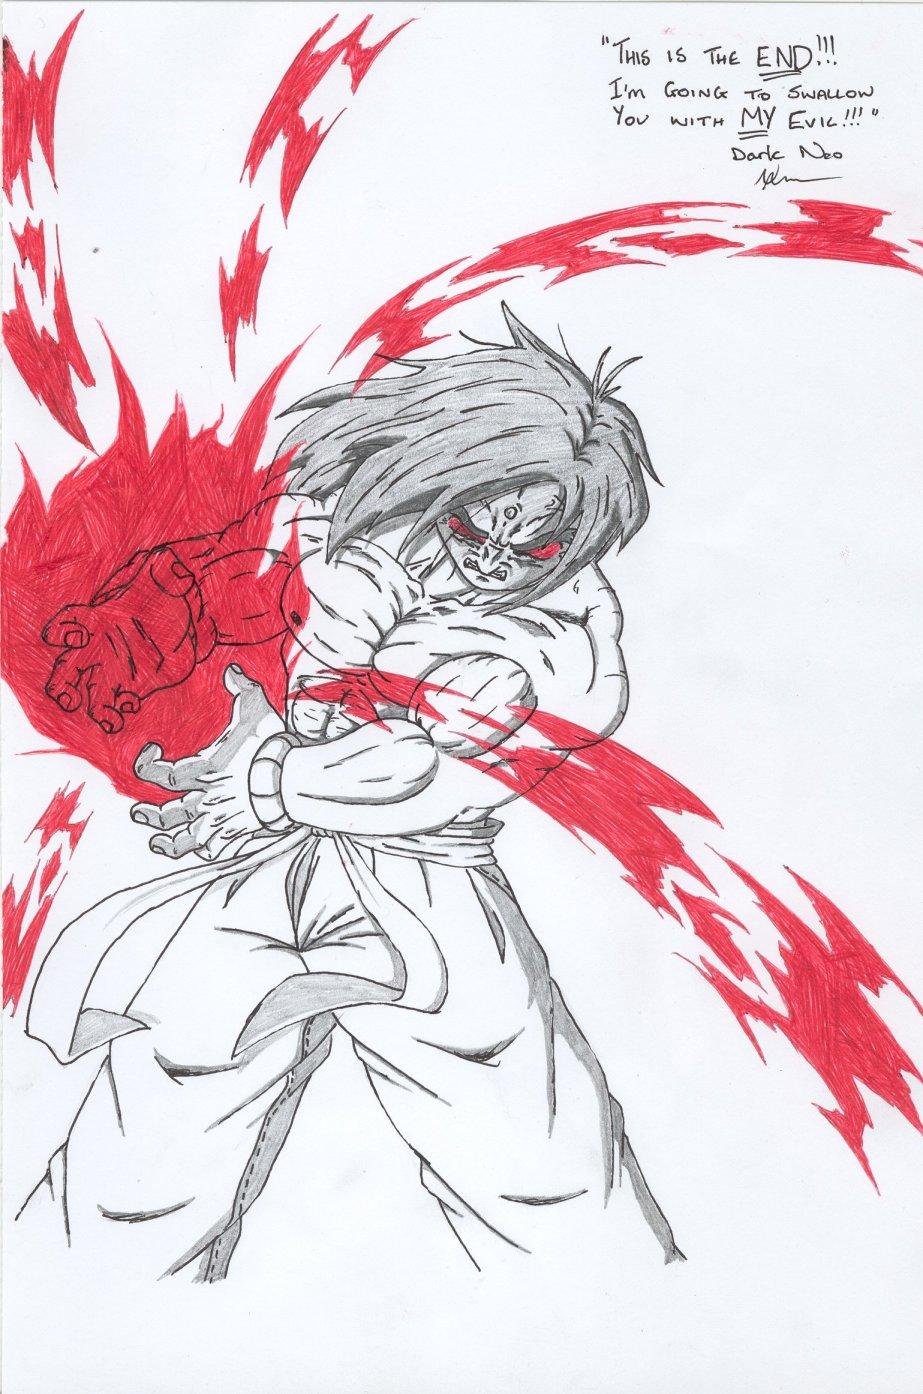 Dark Neo's wrath by Neo_Masaki